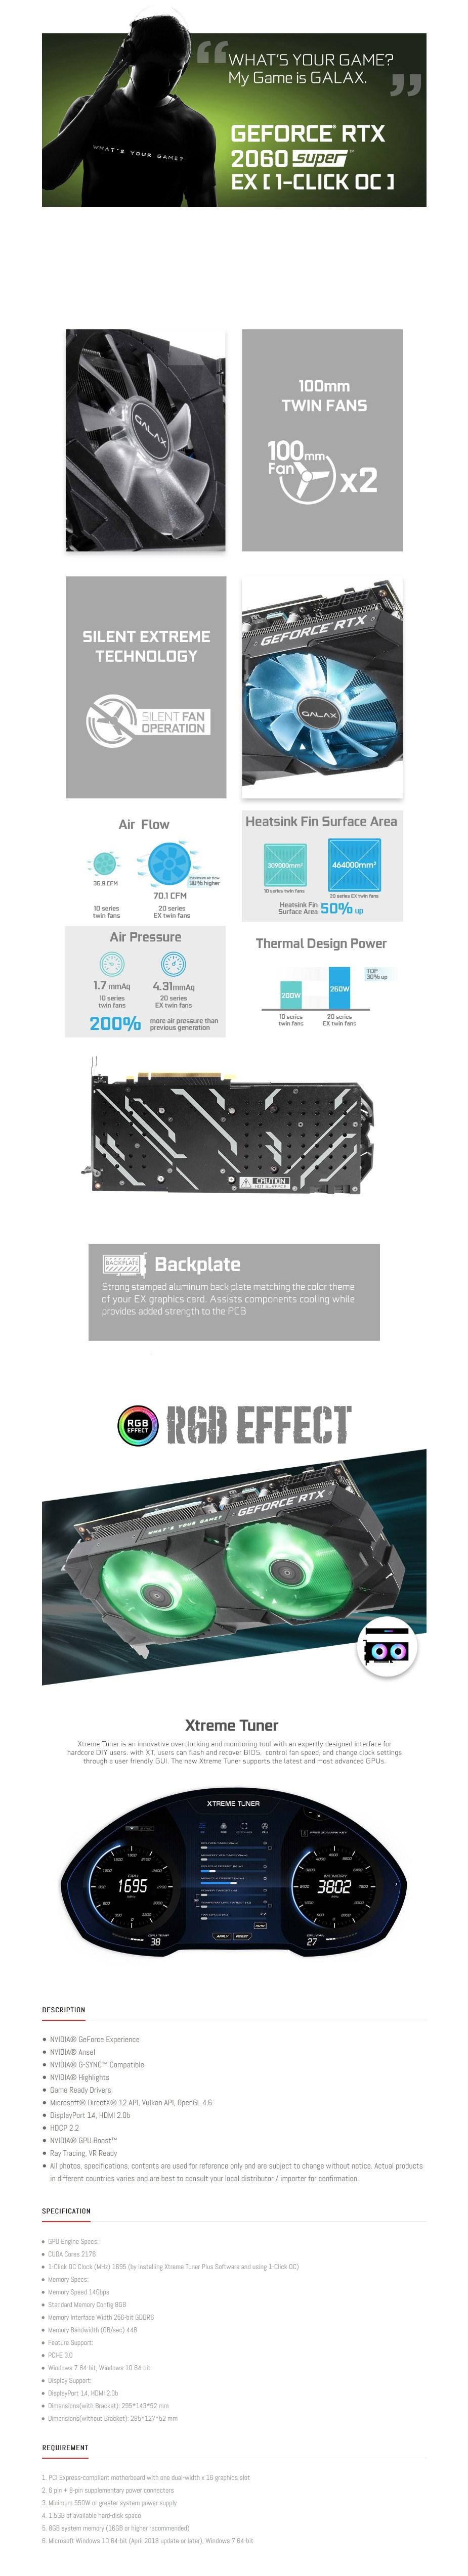 GALAX GeForce RTX 2060 Super EX 1-Click OC 8GB Video Card - Overview 1